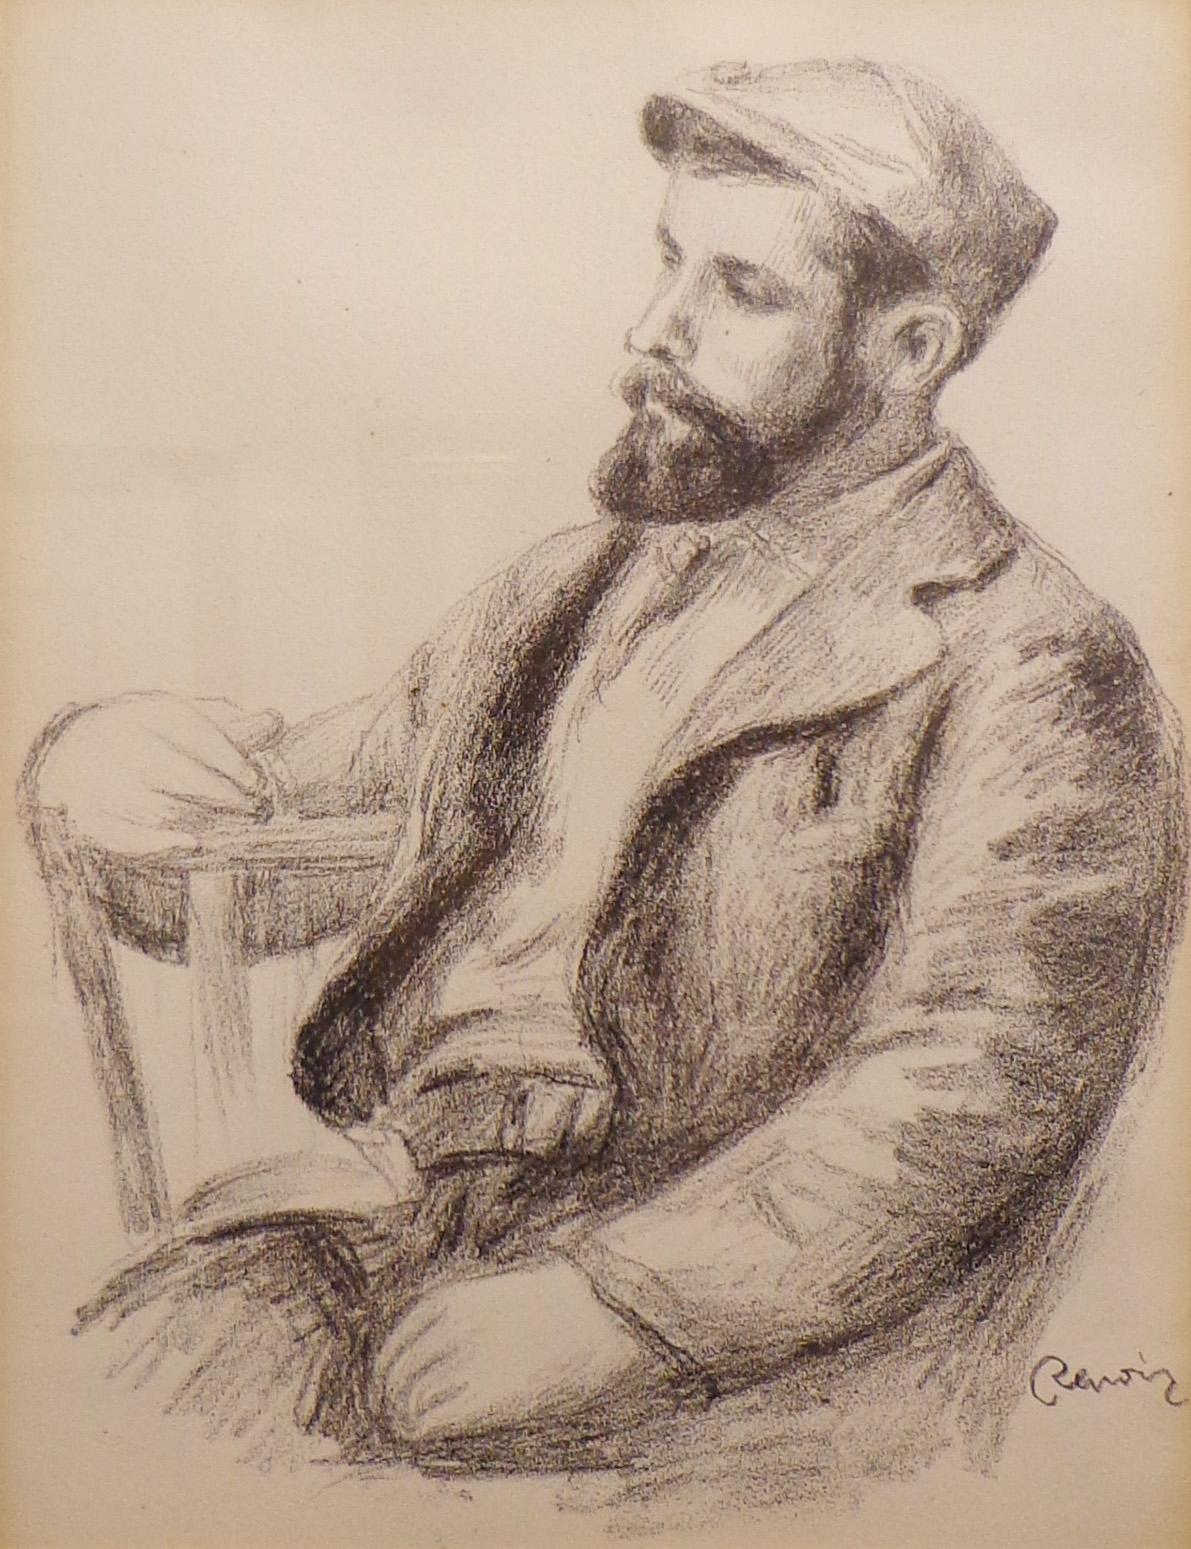 Renoir, Louie Valtat